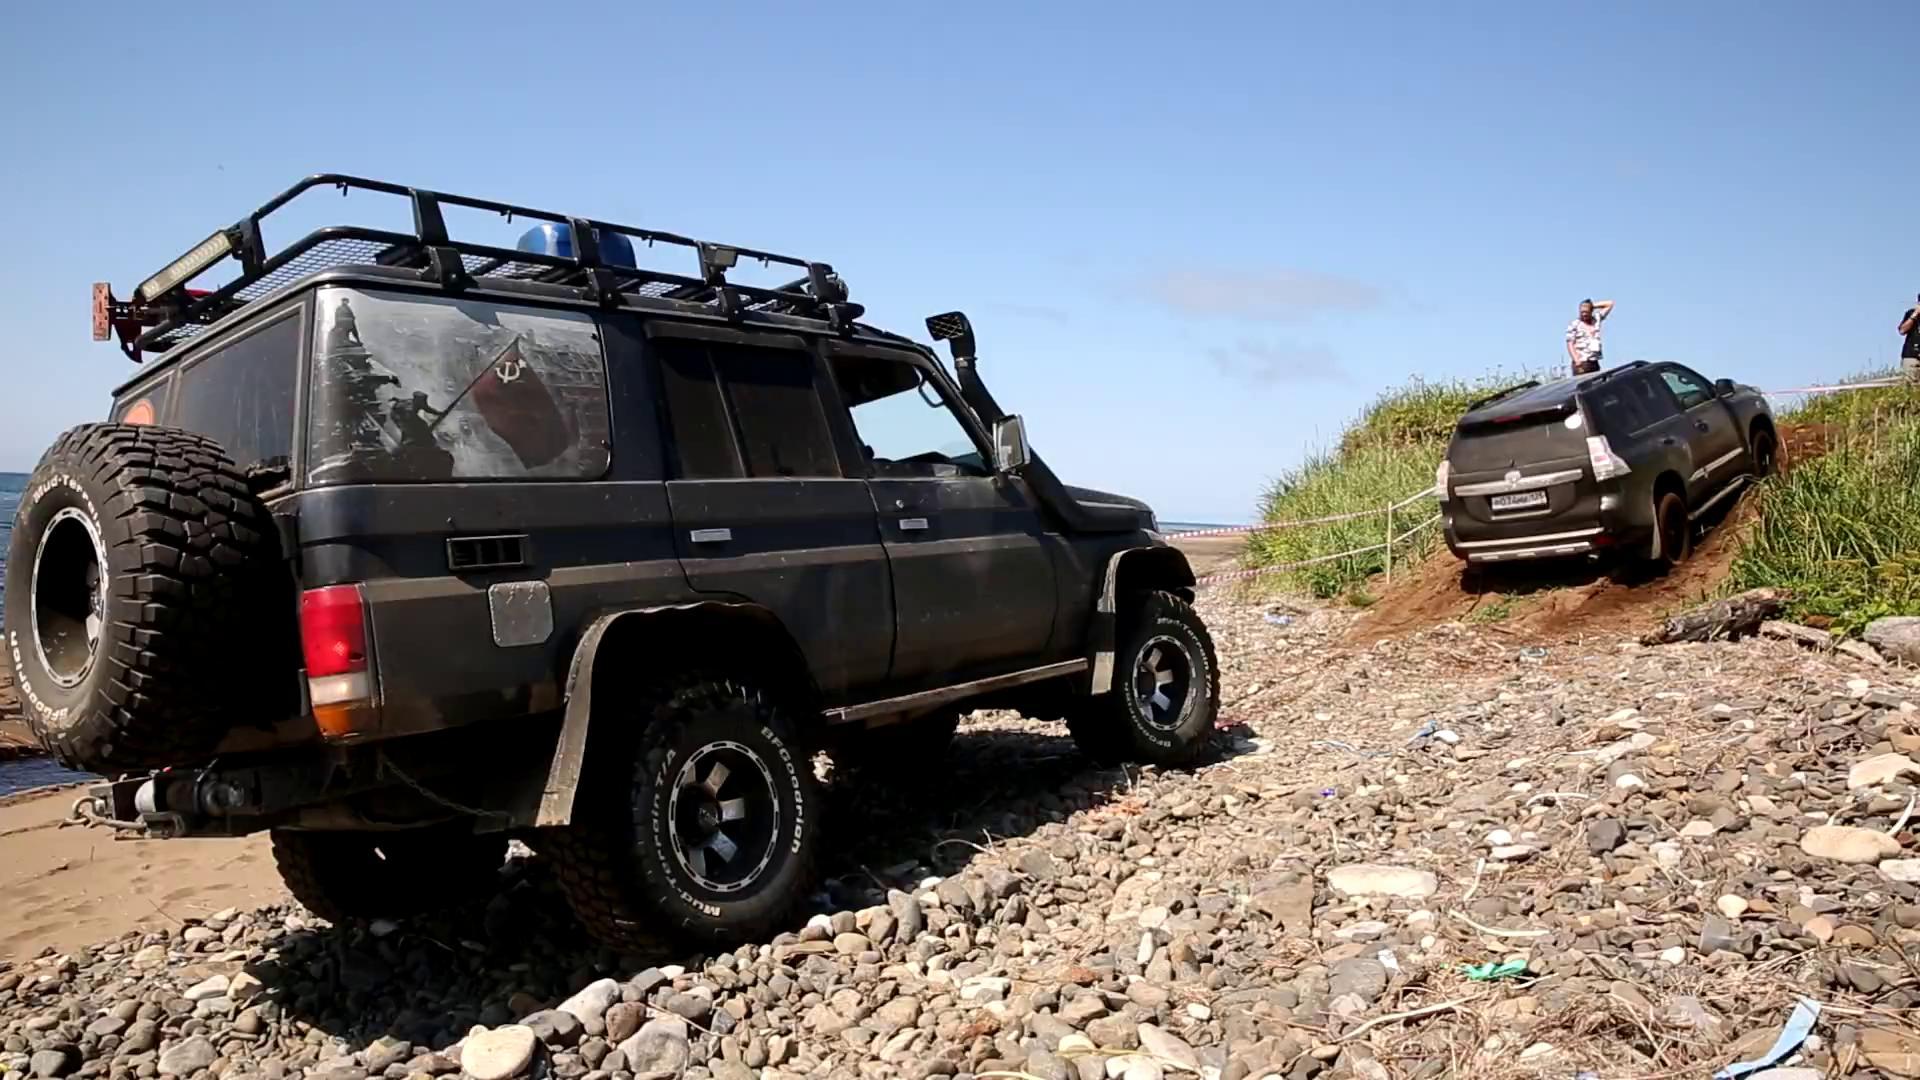 LandCruiser 200 | Off Road Vehicle | Toyota Australia